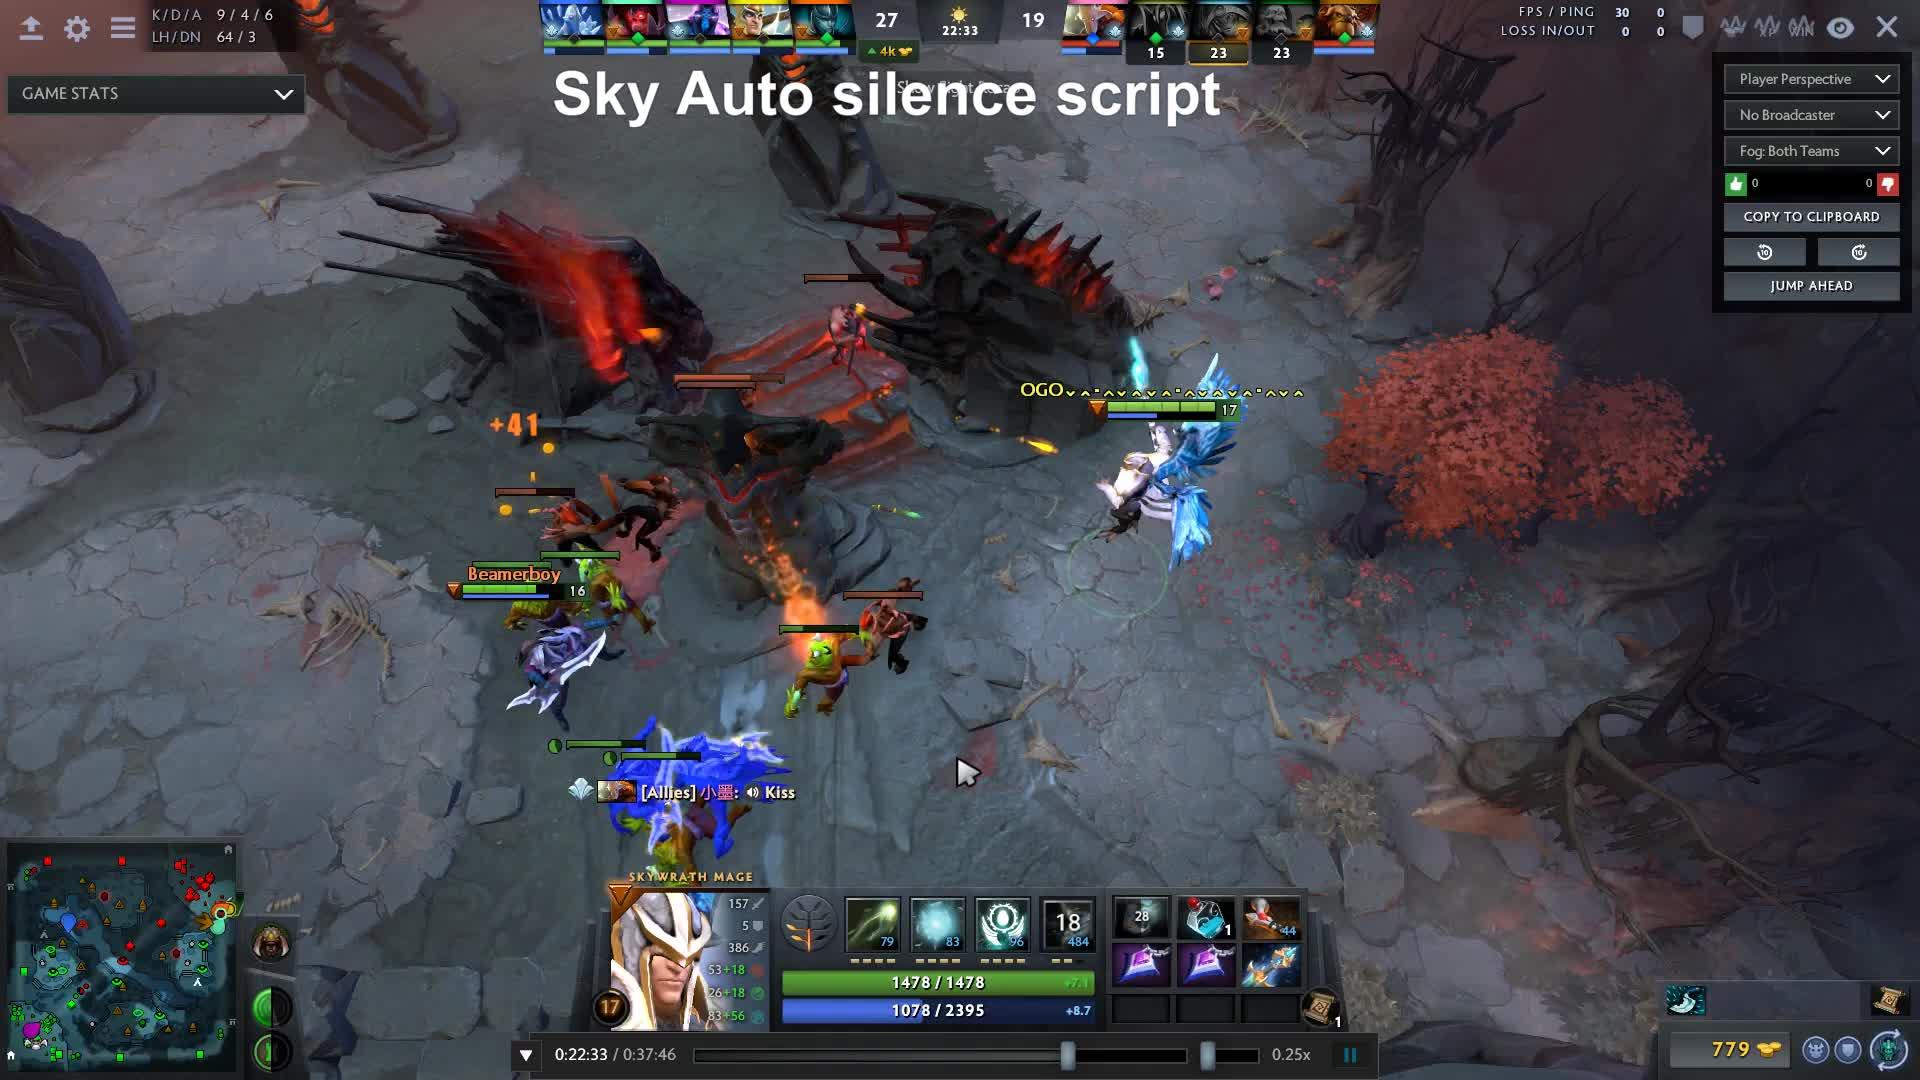 Dota 2 Autocast Script Cheater Proof Player Perspective 1